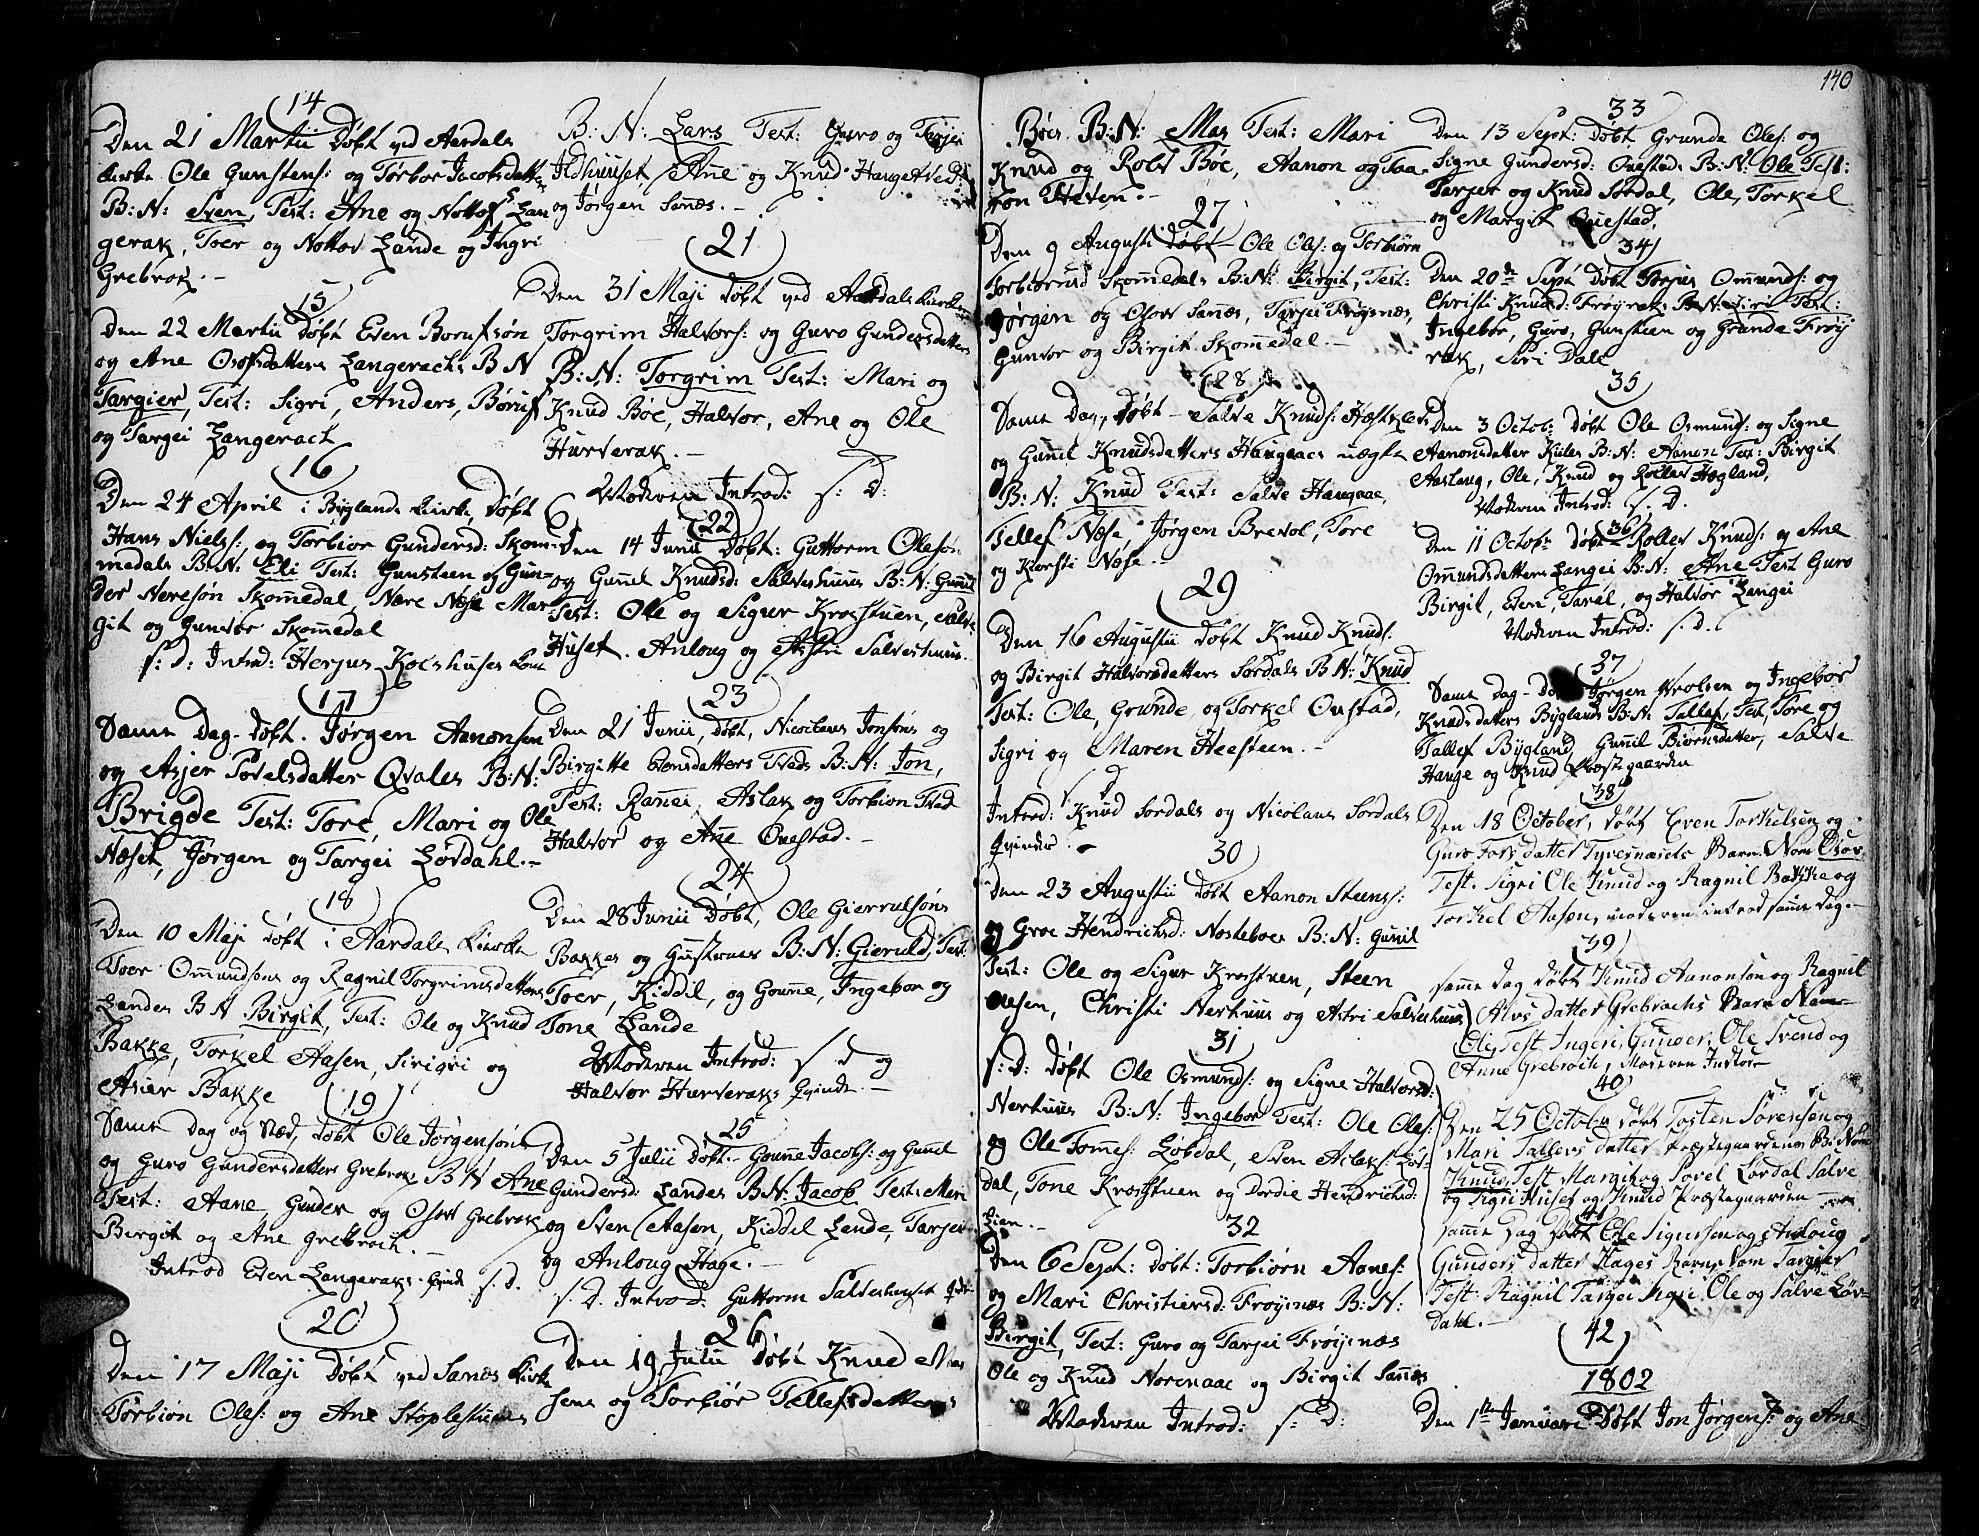 SAK, Bygland sokneprestkontor, F/Fa/Fab/L0002: Ministerialbok nr. A 2, 1766-1816, s. 134